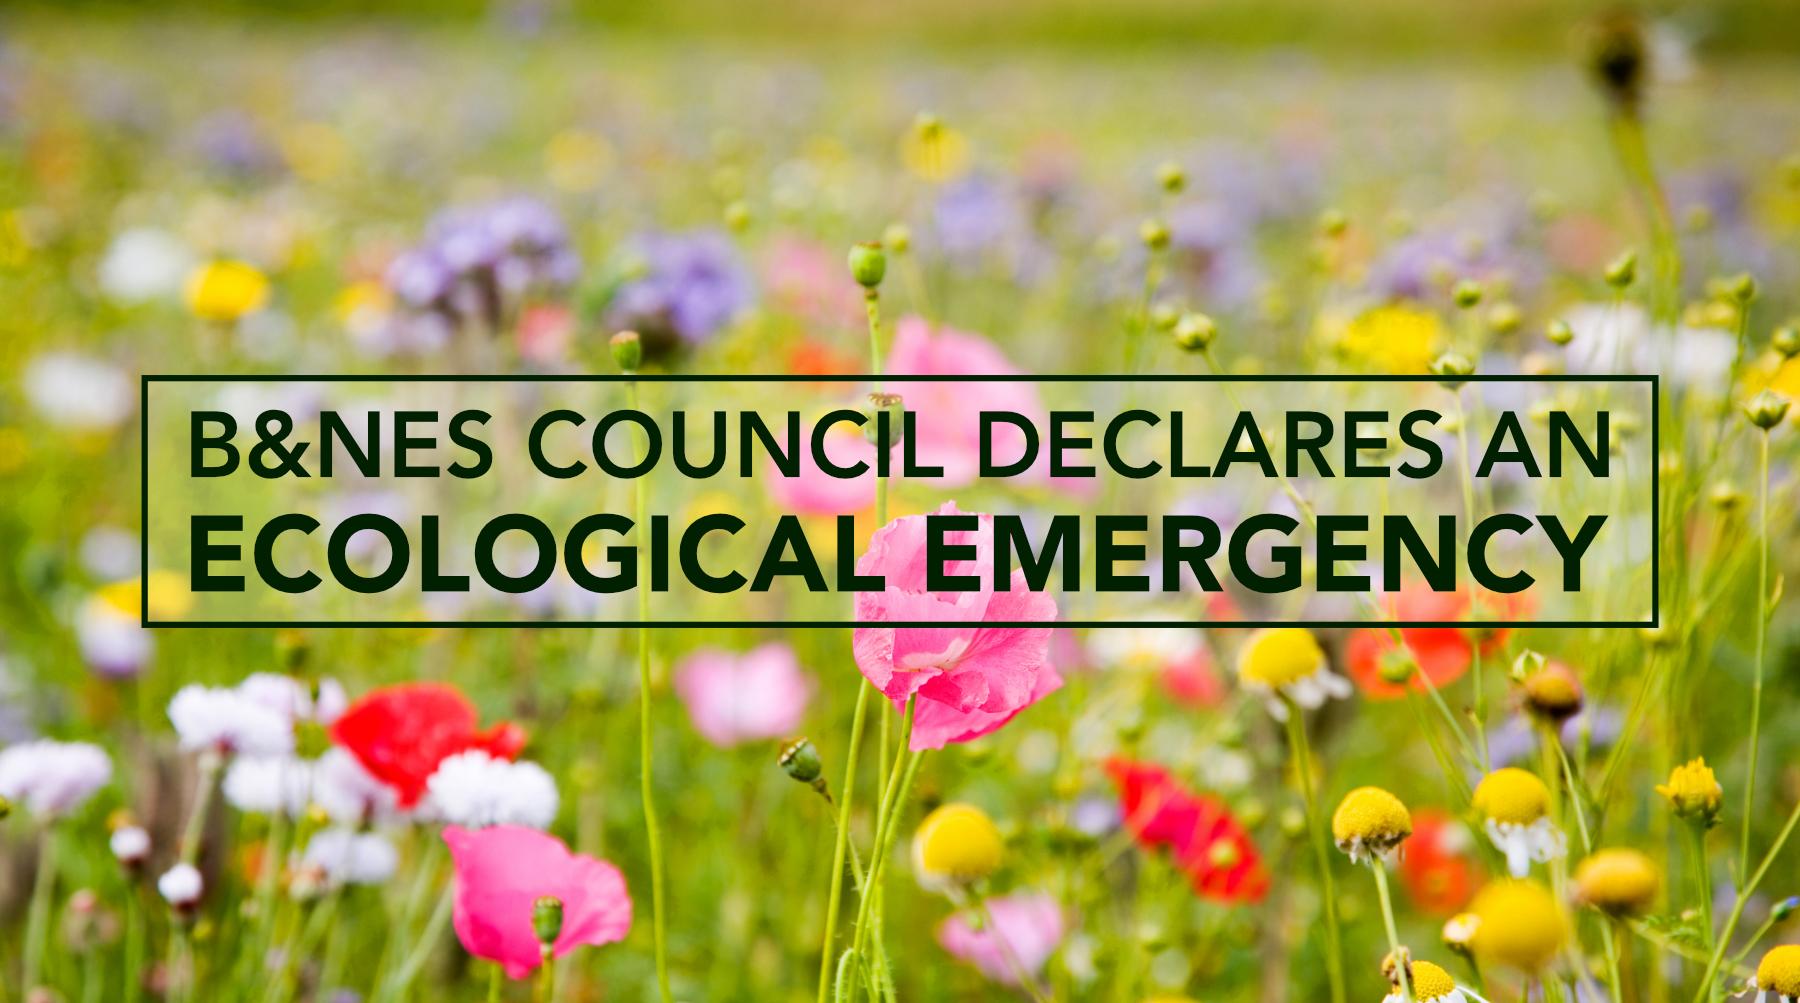 B&NES Declares Ecological Emergency